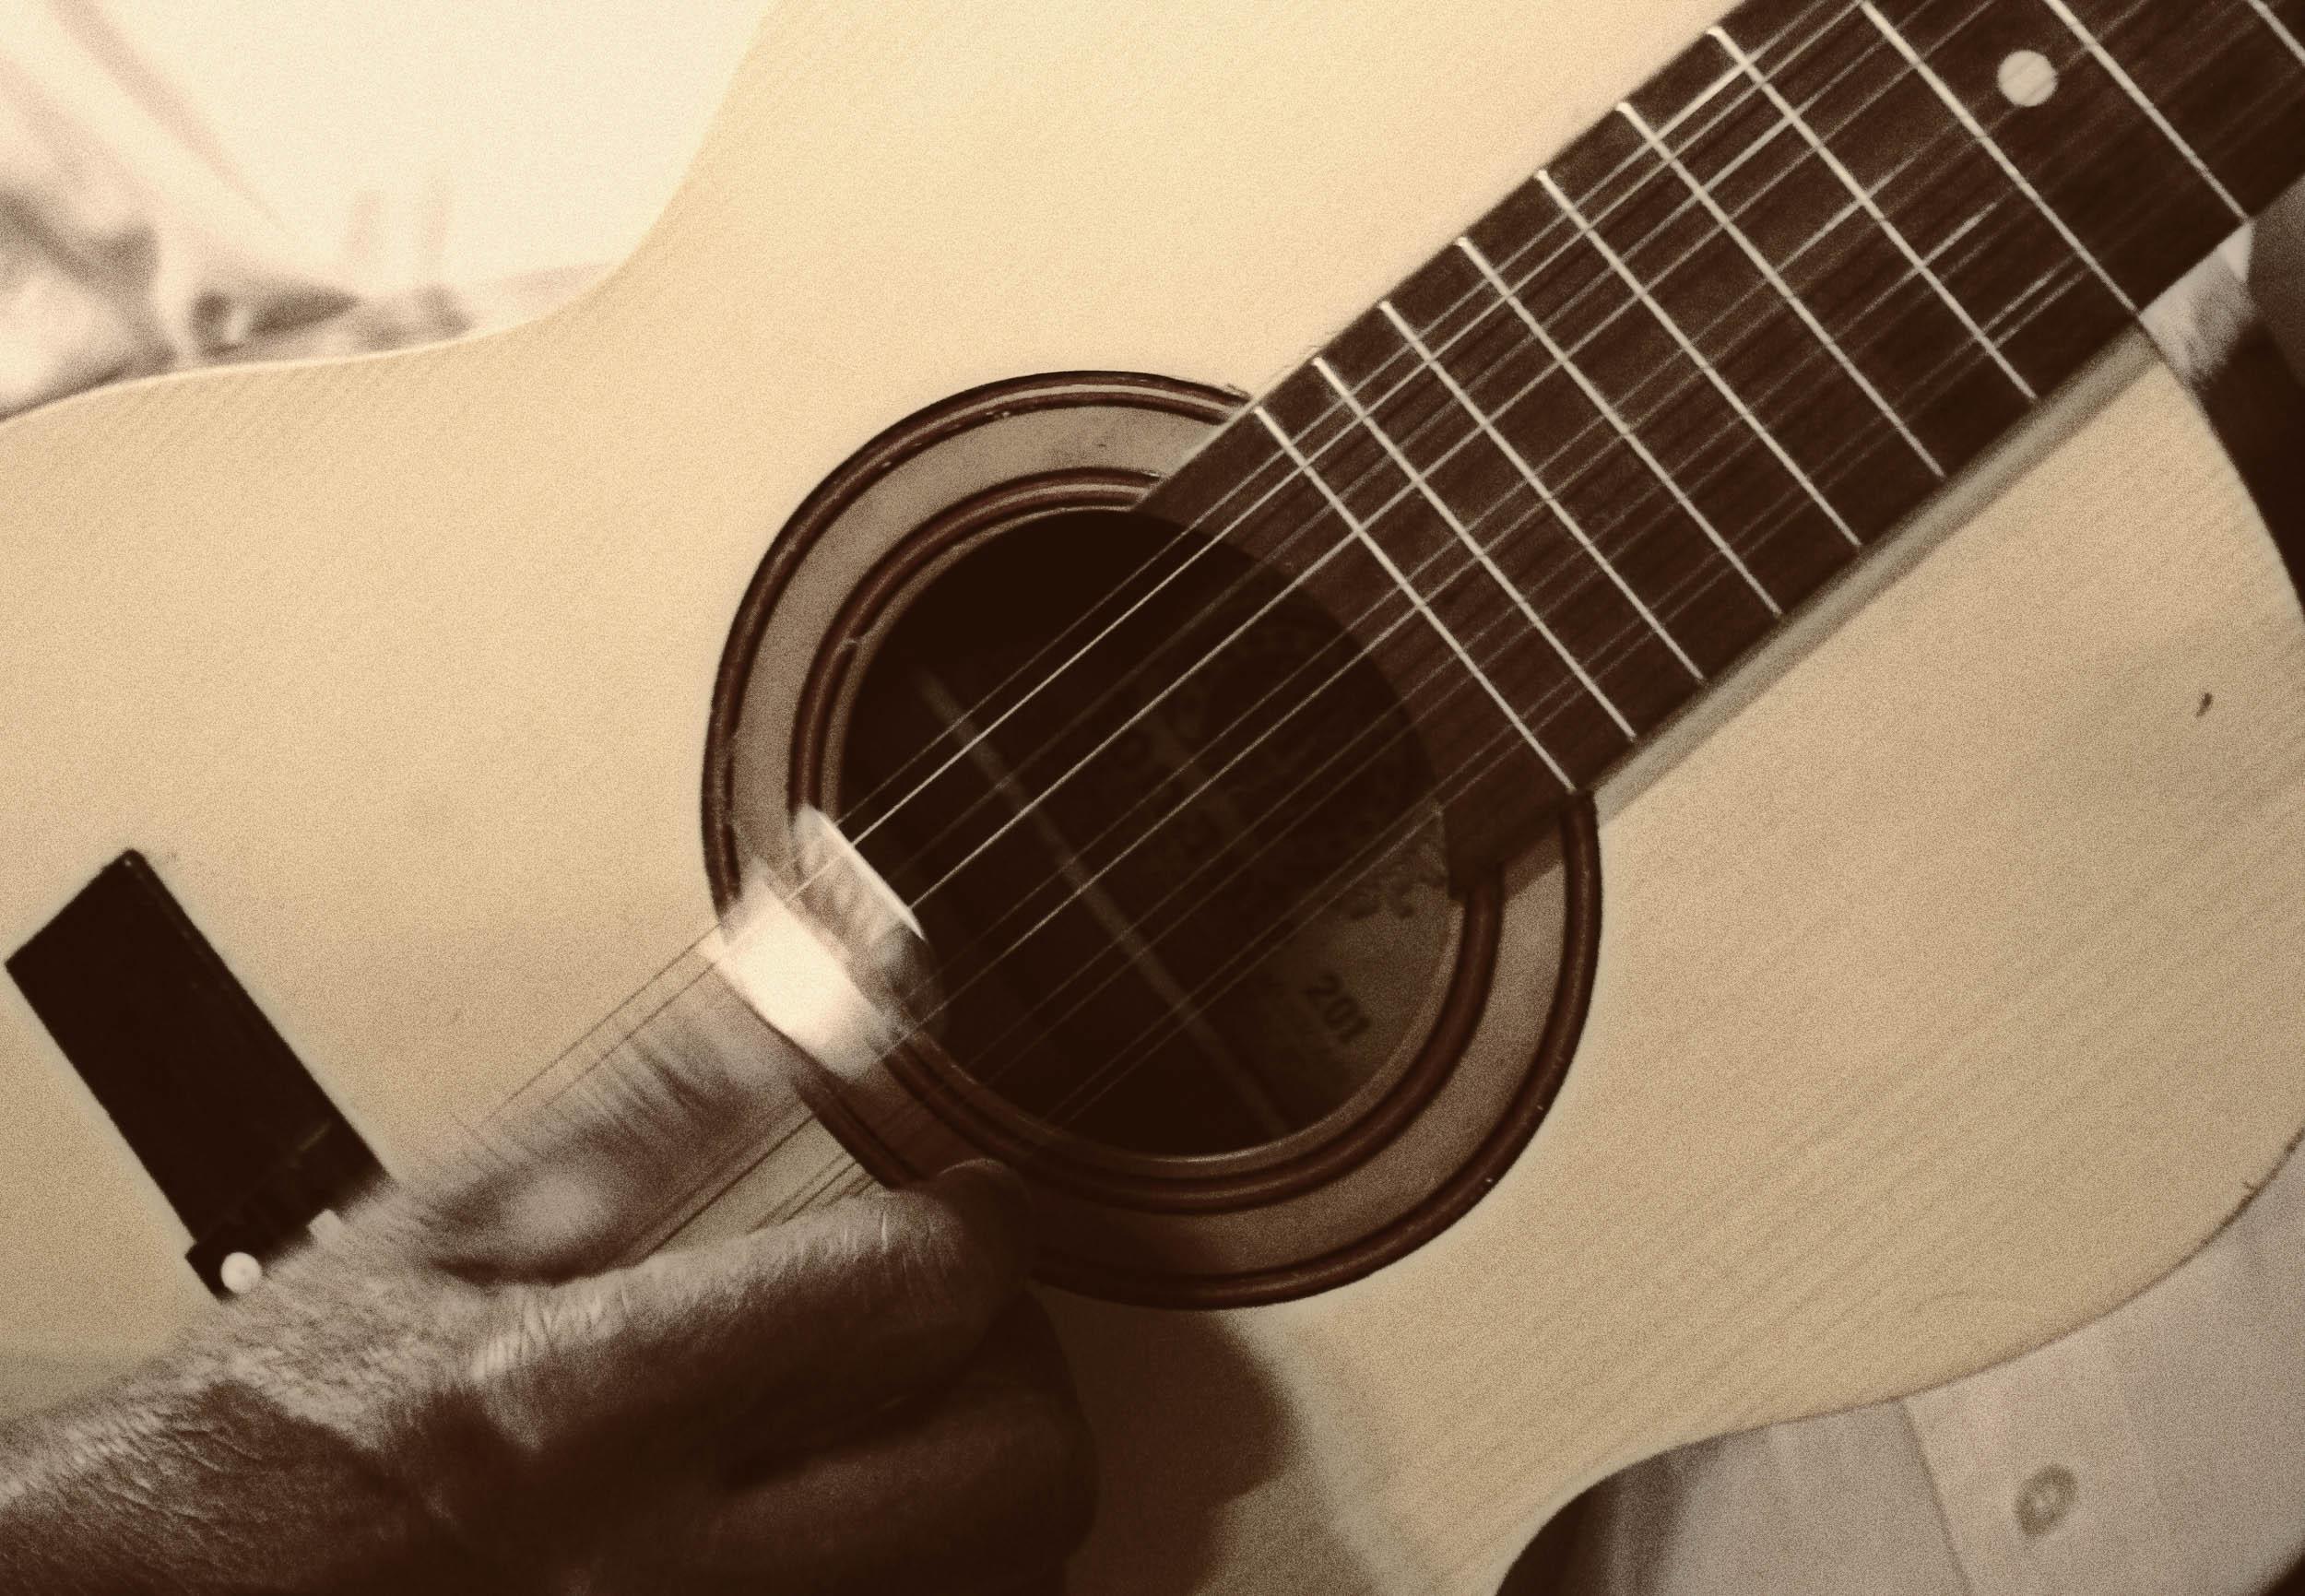 Acorde Sertanejo-acorde sertanejo 1